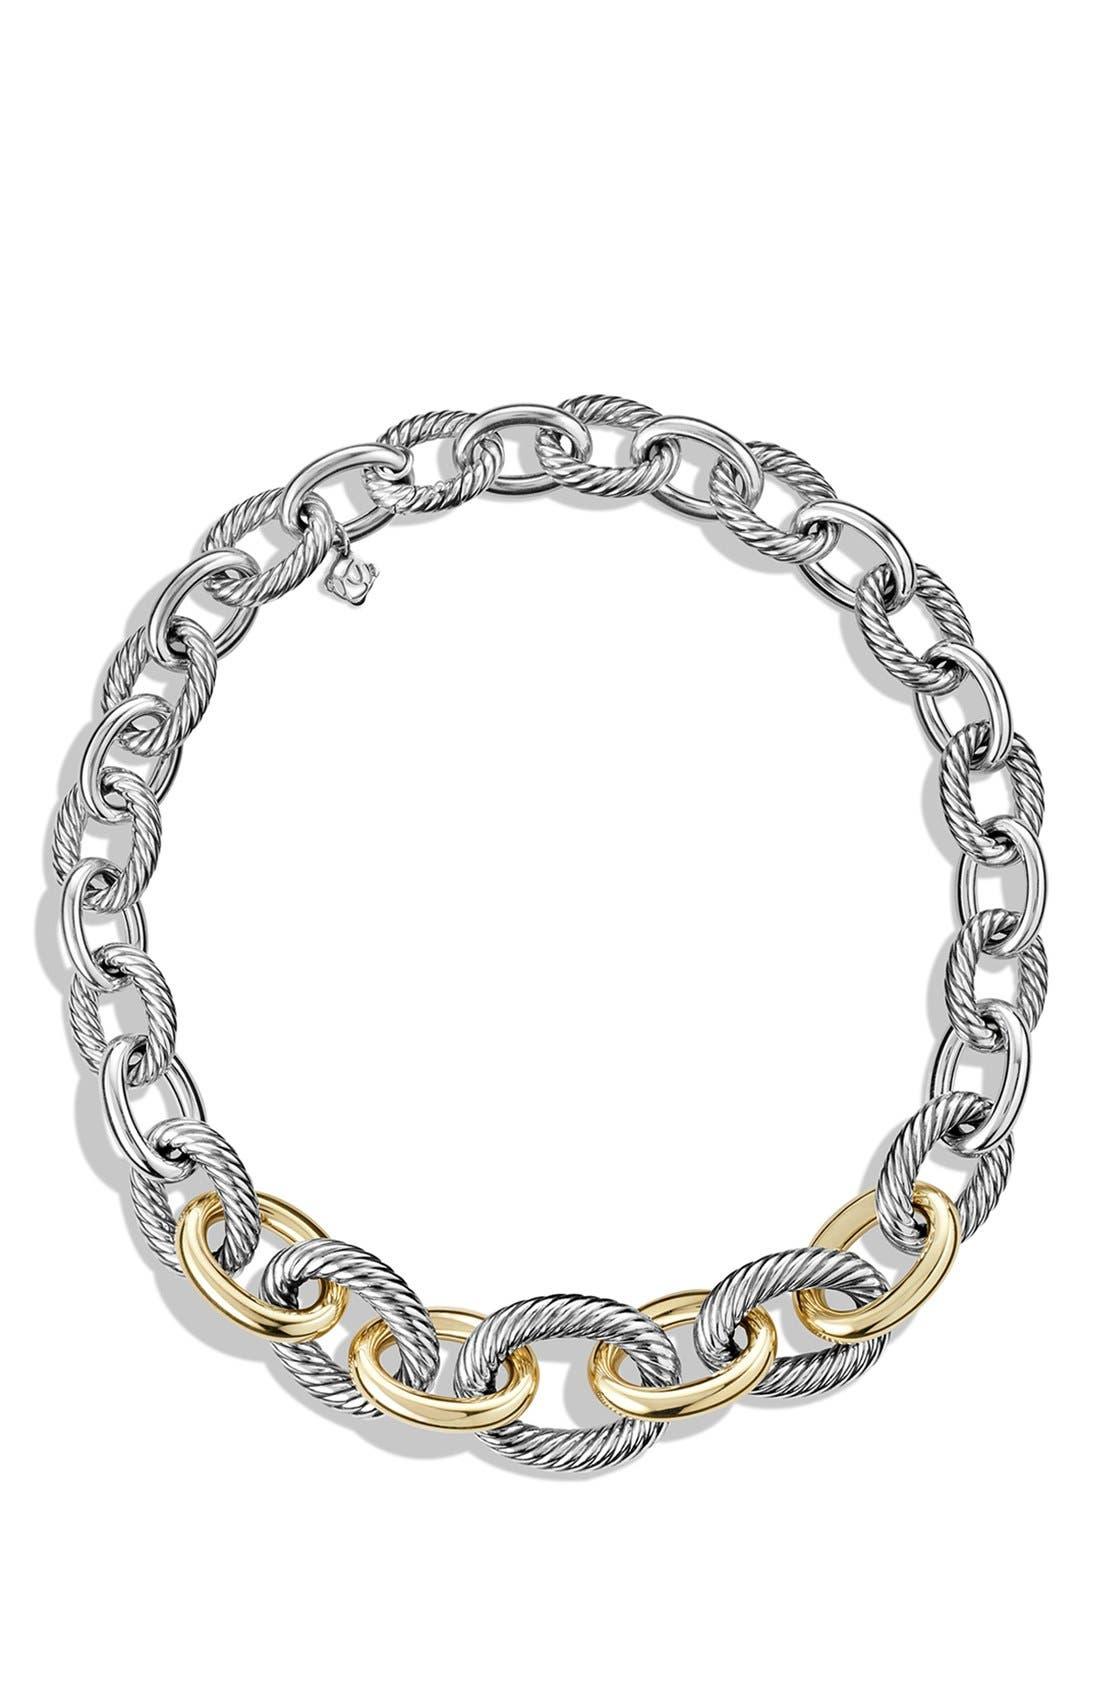 Main Image - David Yurman 'Chain' Medium Oval Necklace with 14K Gold